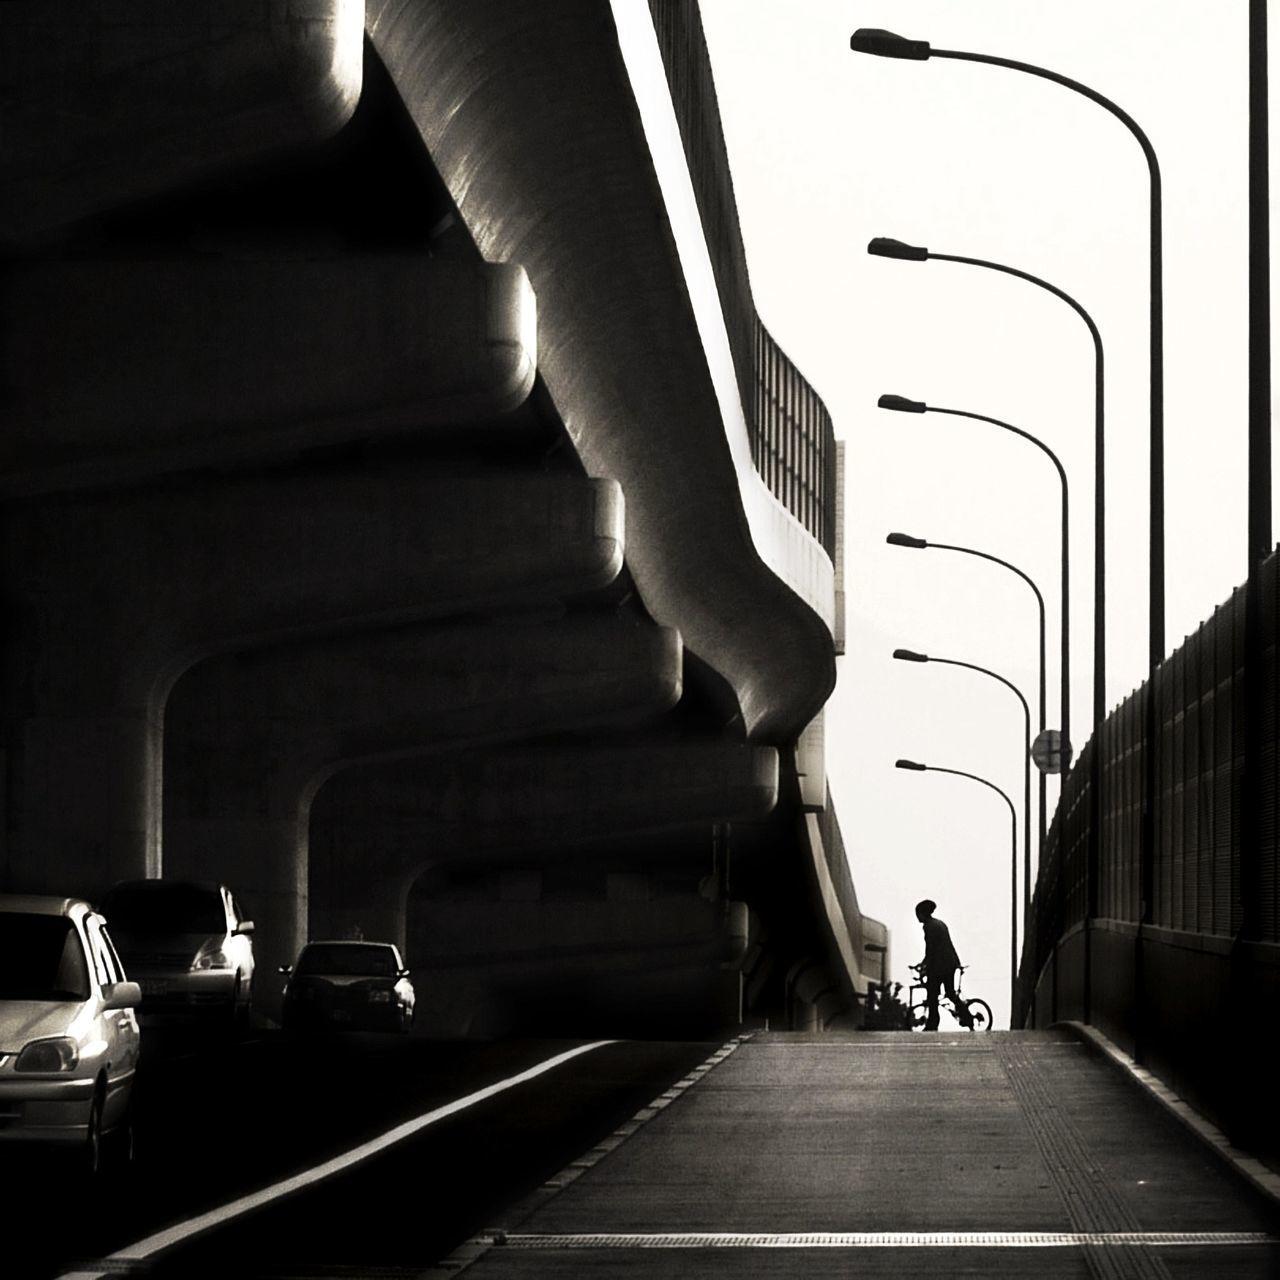 Cars highway by bridge in city